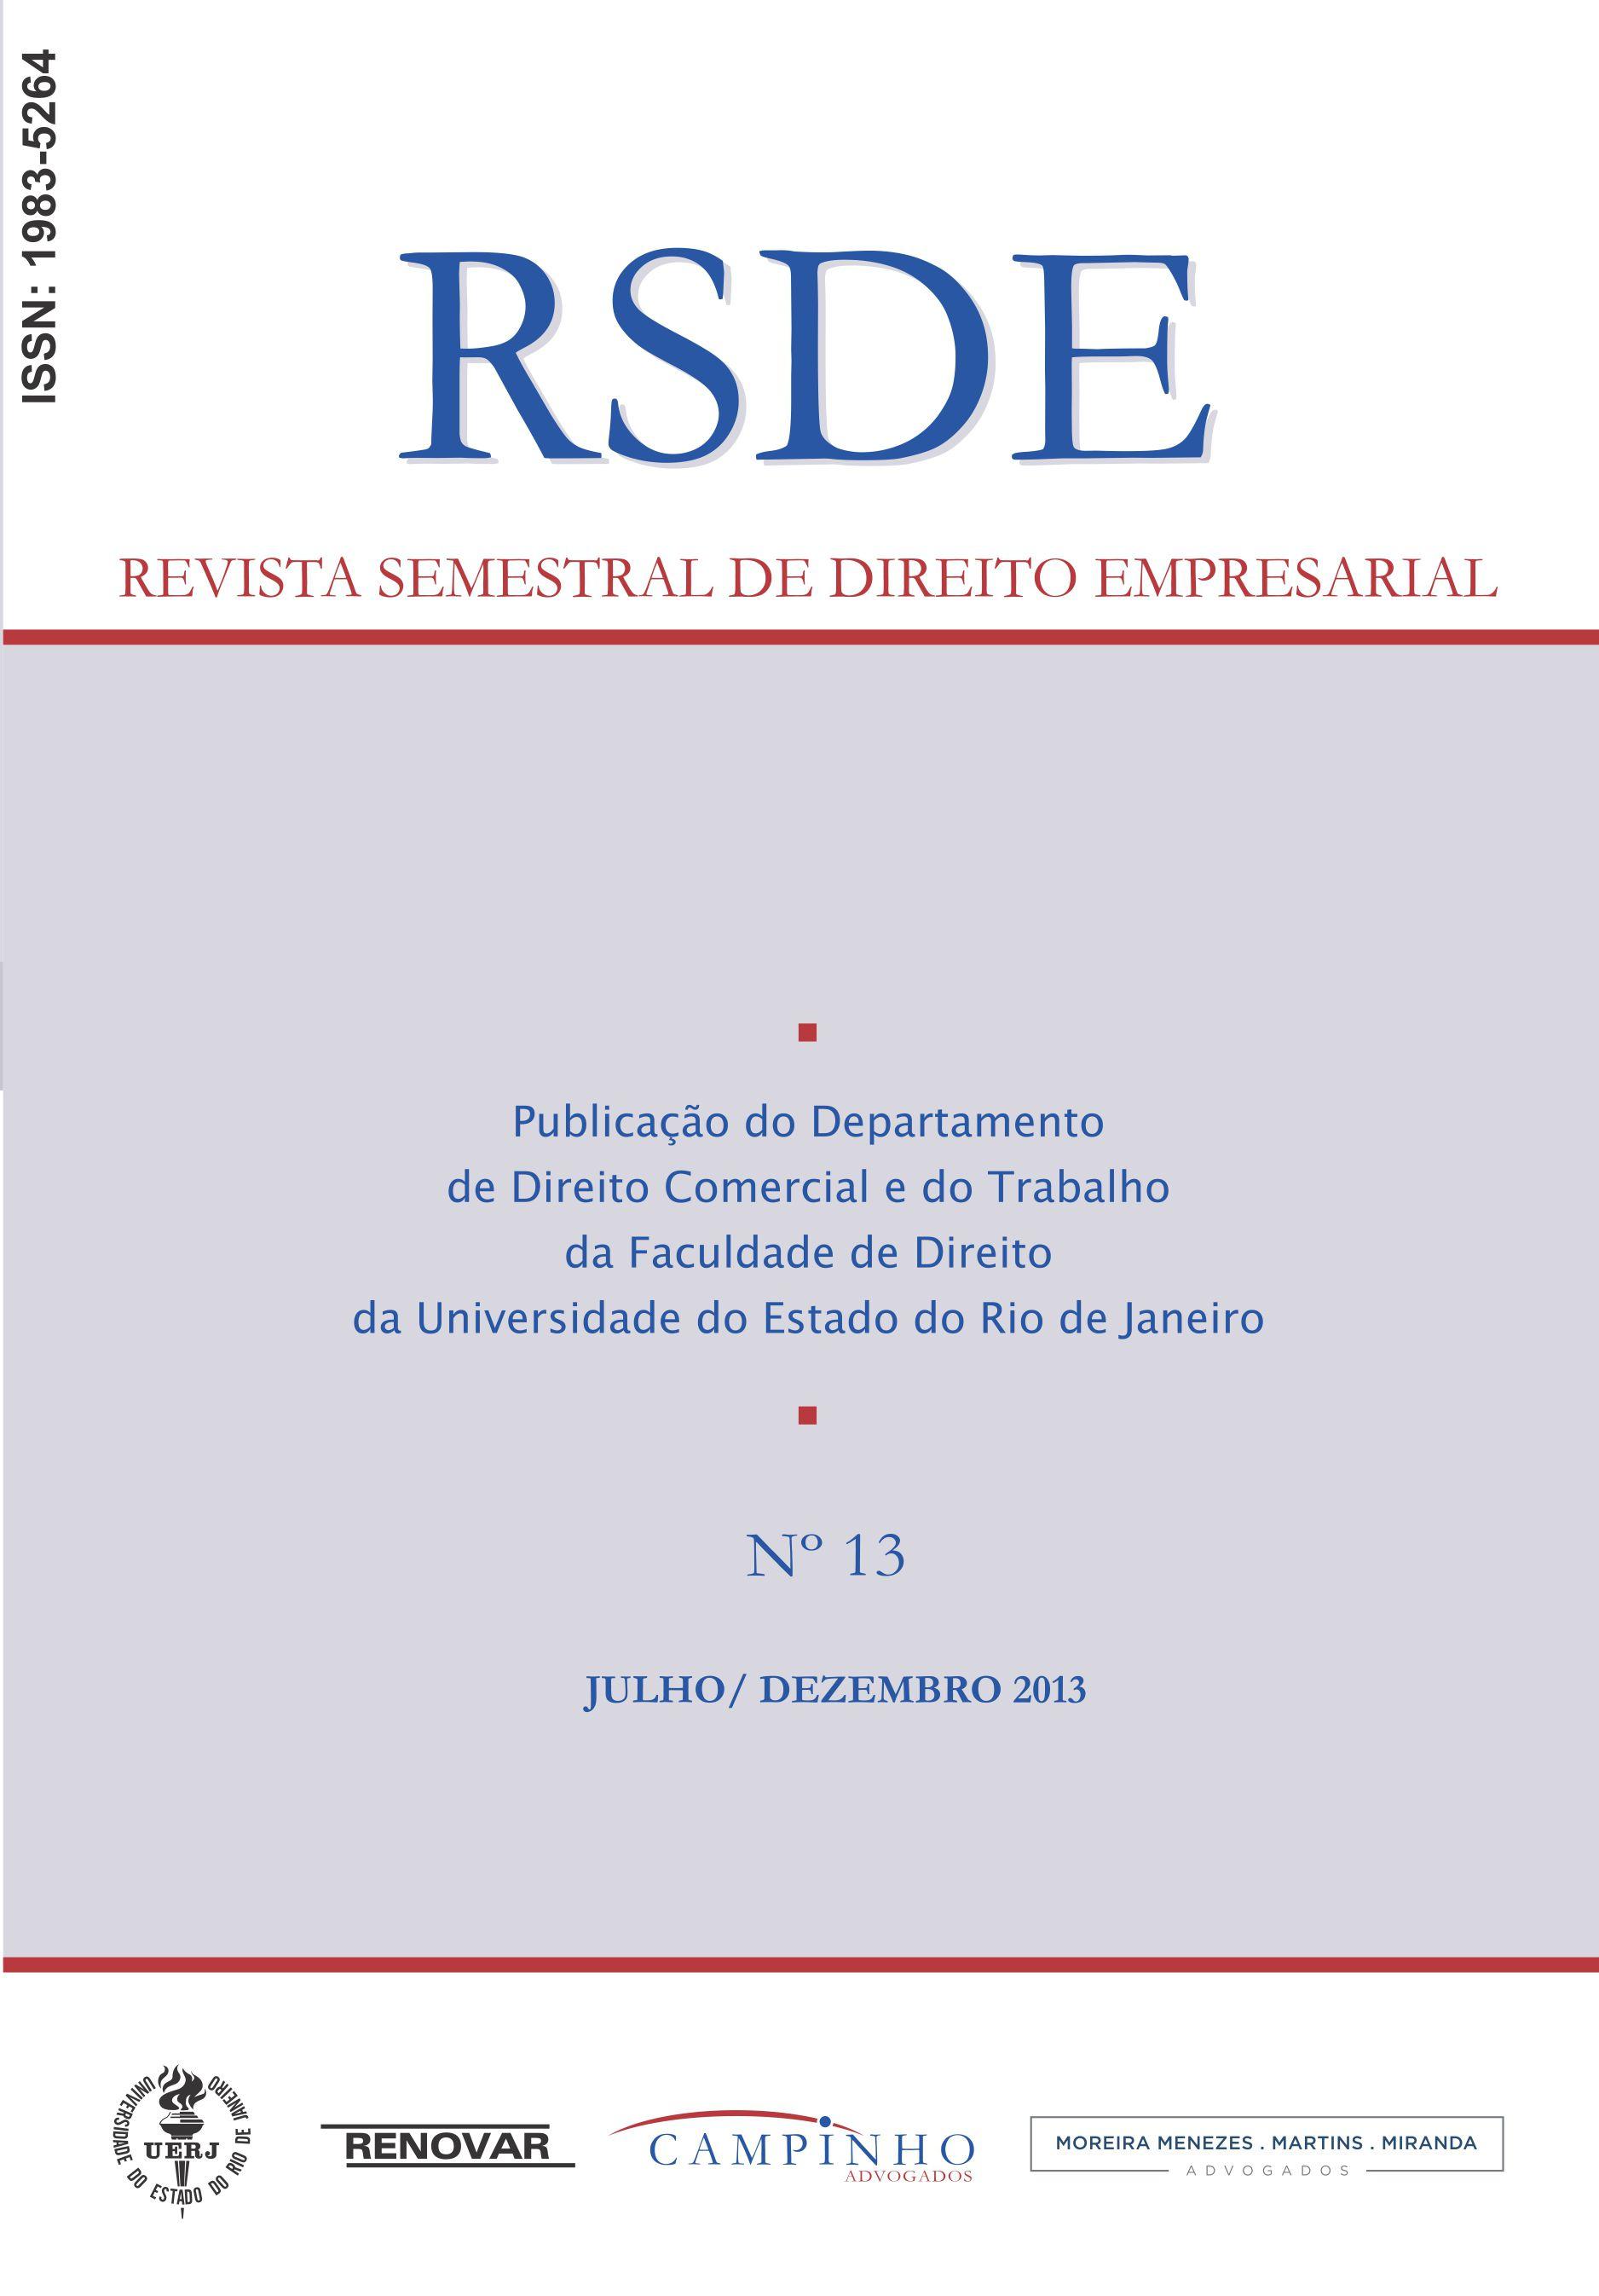 Capa_revista_rsde13